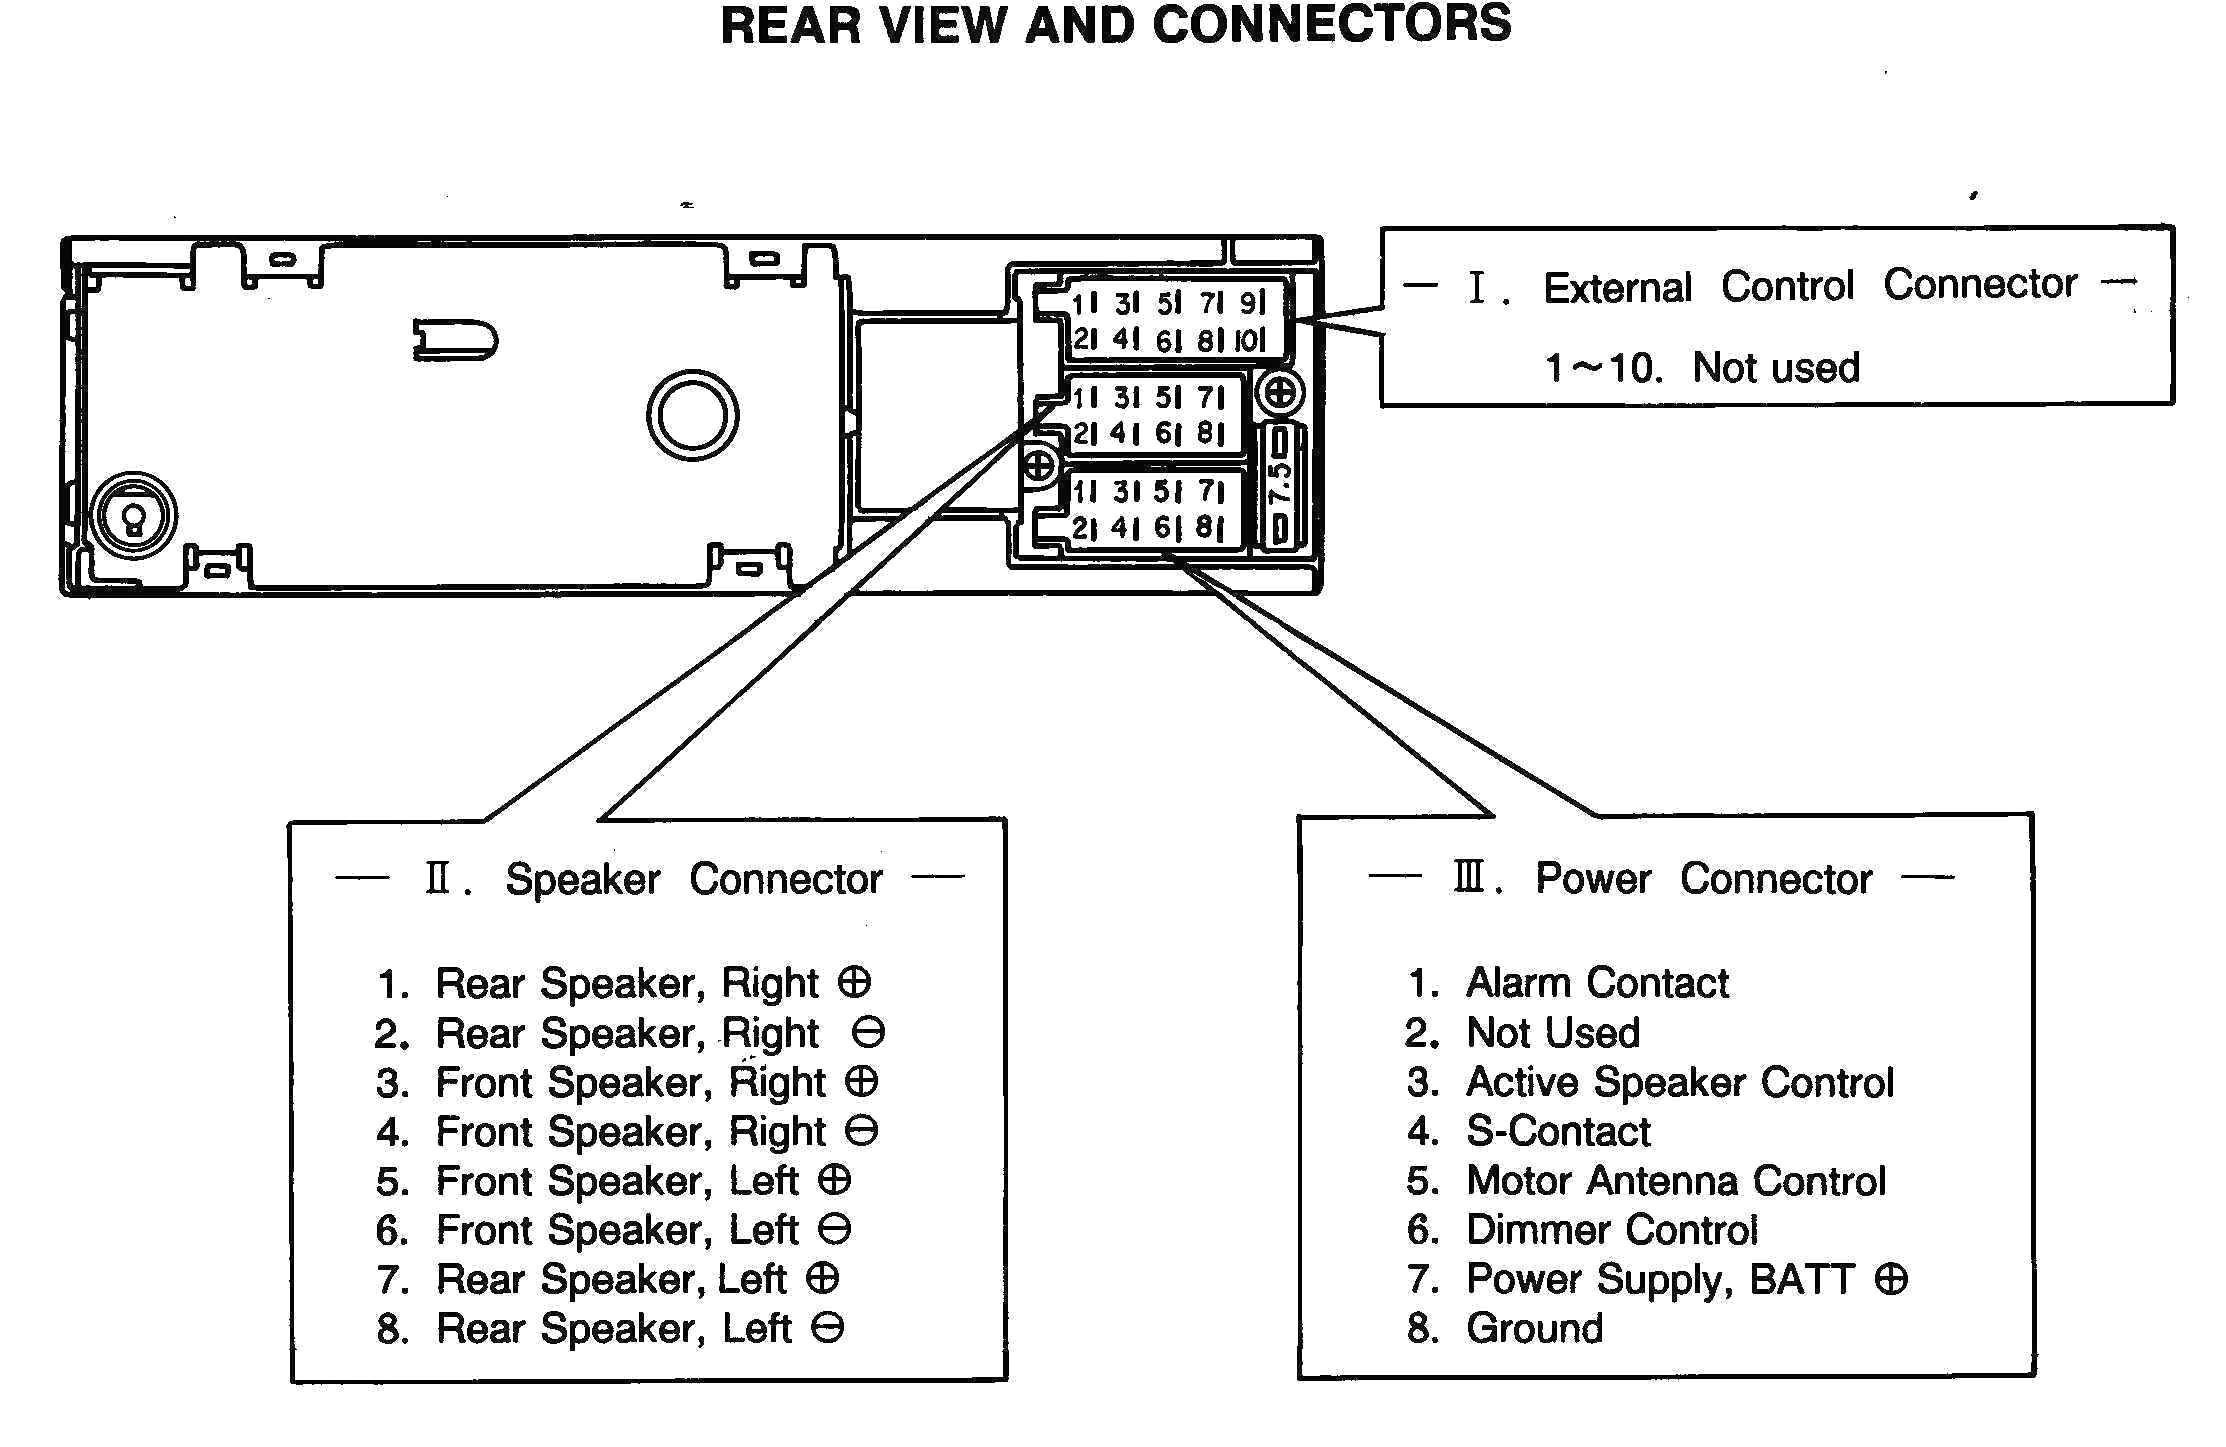 Harley Davidson Ultra Radio Wiring Diagram Circuit And Remote Start Car Starter Cb Gm Rh Detoxicrecenze Com Stereo Schematic 2003 Tach